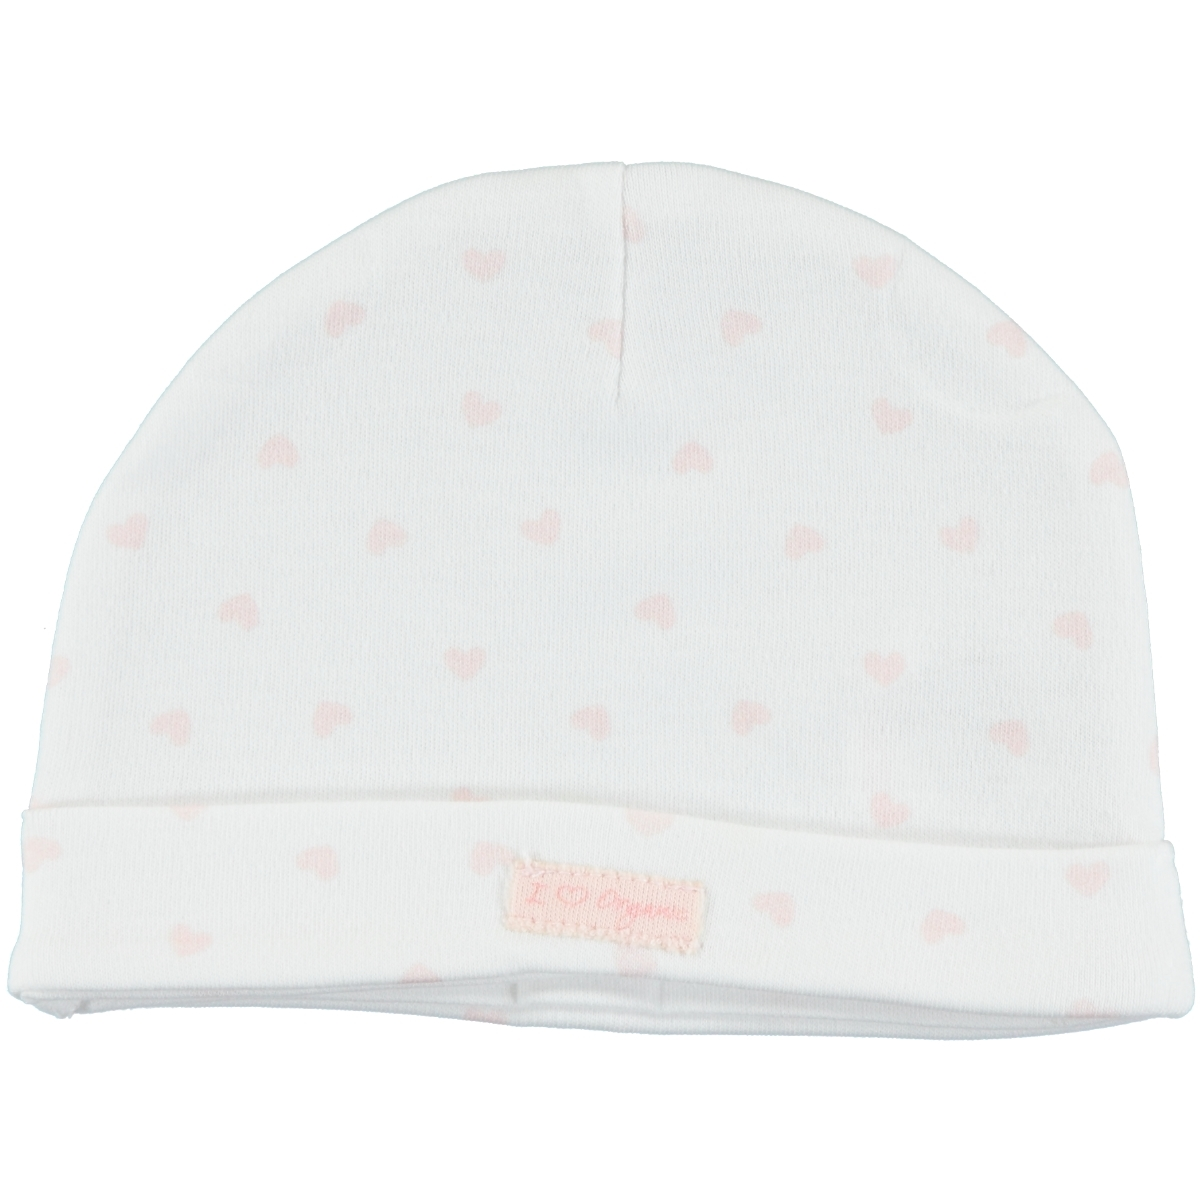 Kiti Kate Organic Combed Cotton Hat Pink 0-3 Months